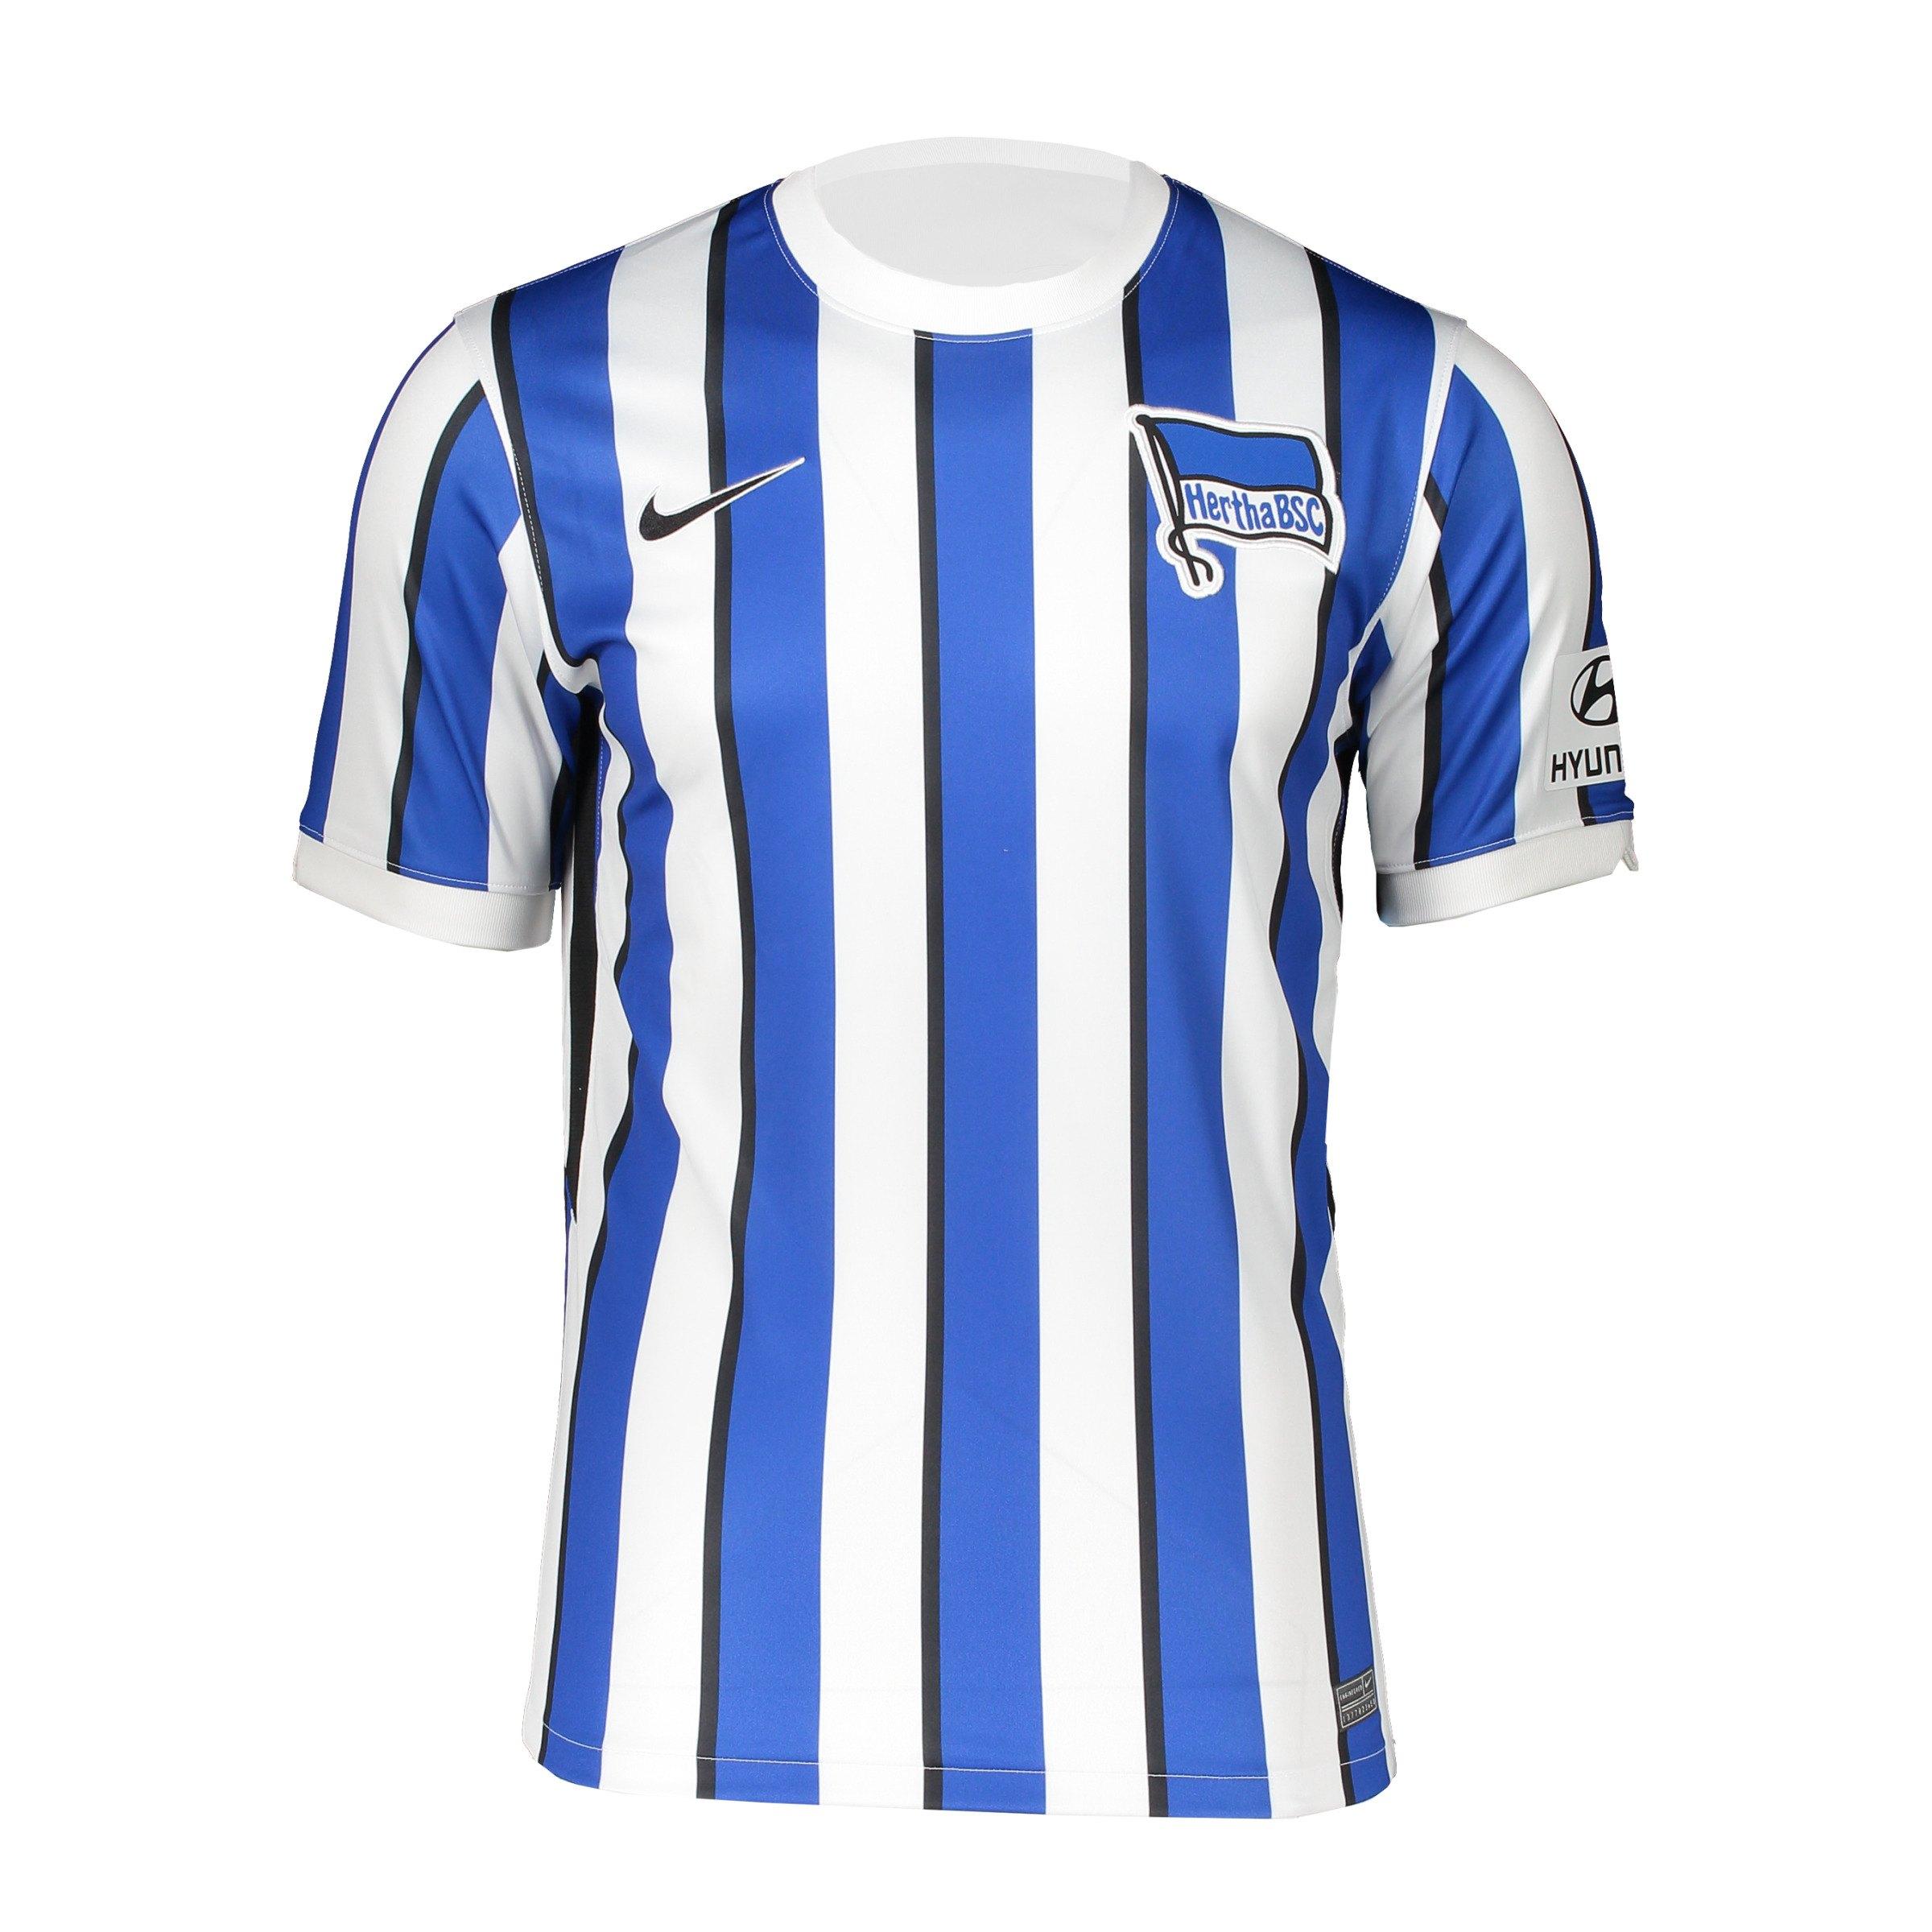 Hertha Bsc Neues Trikot